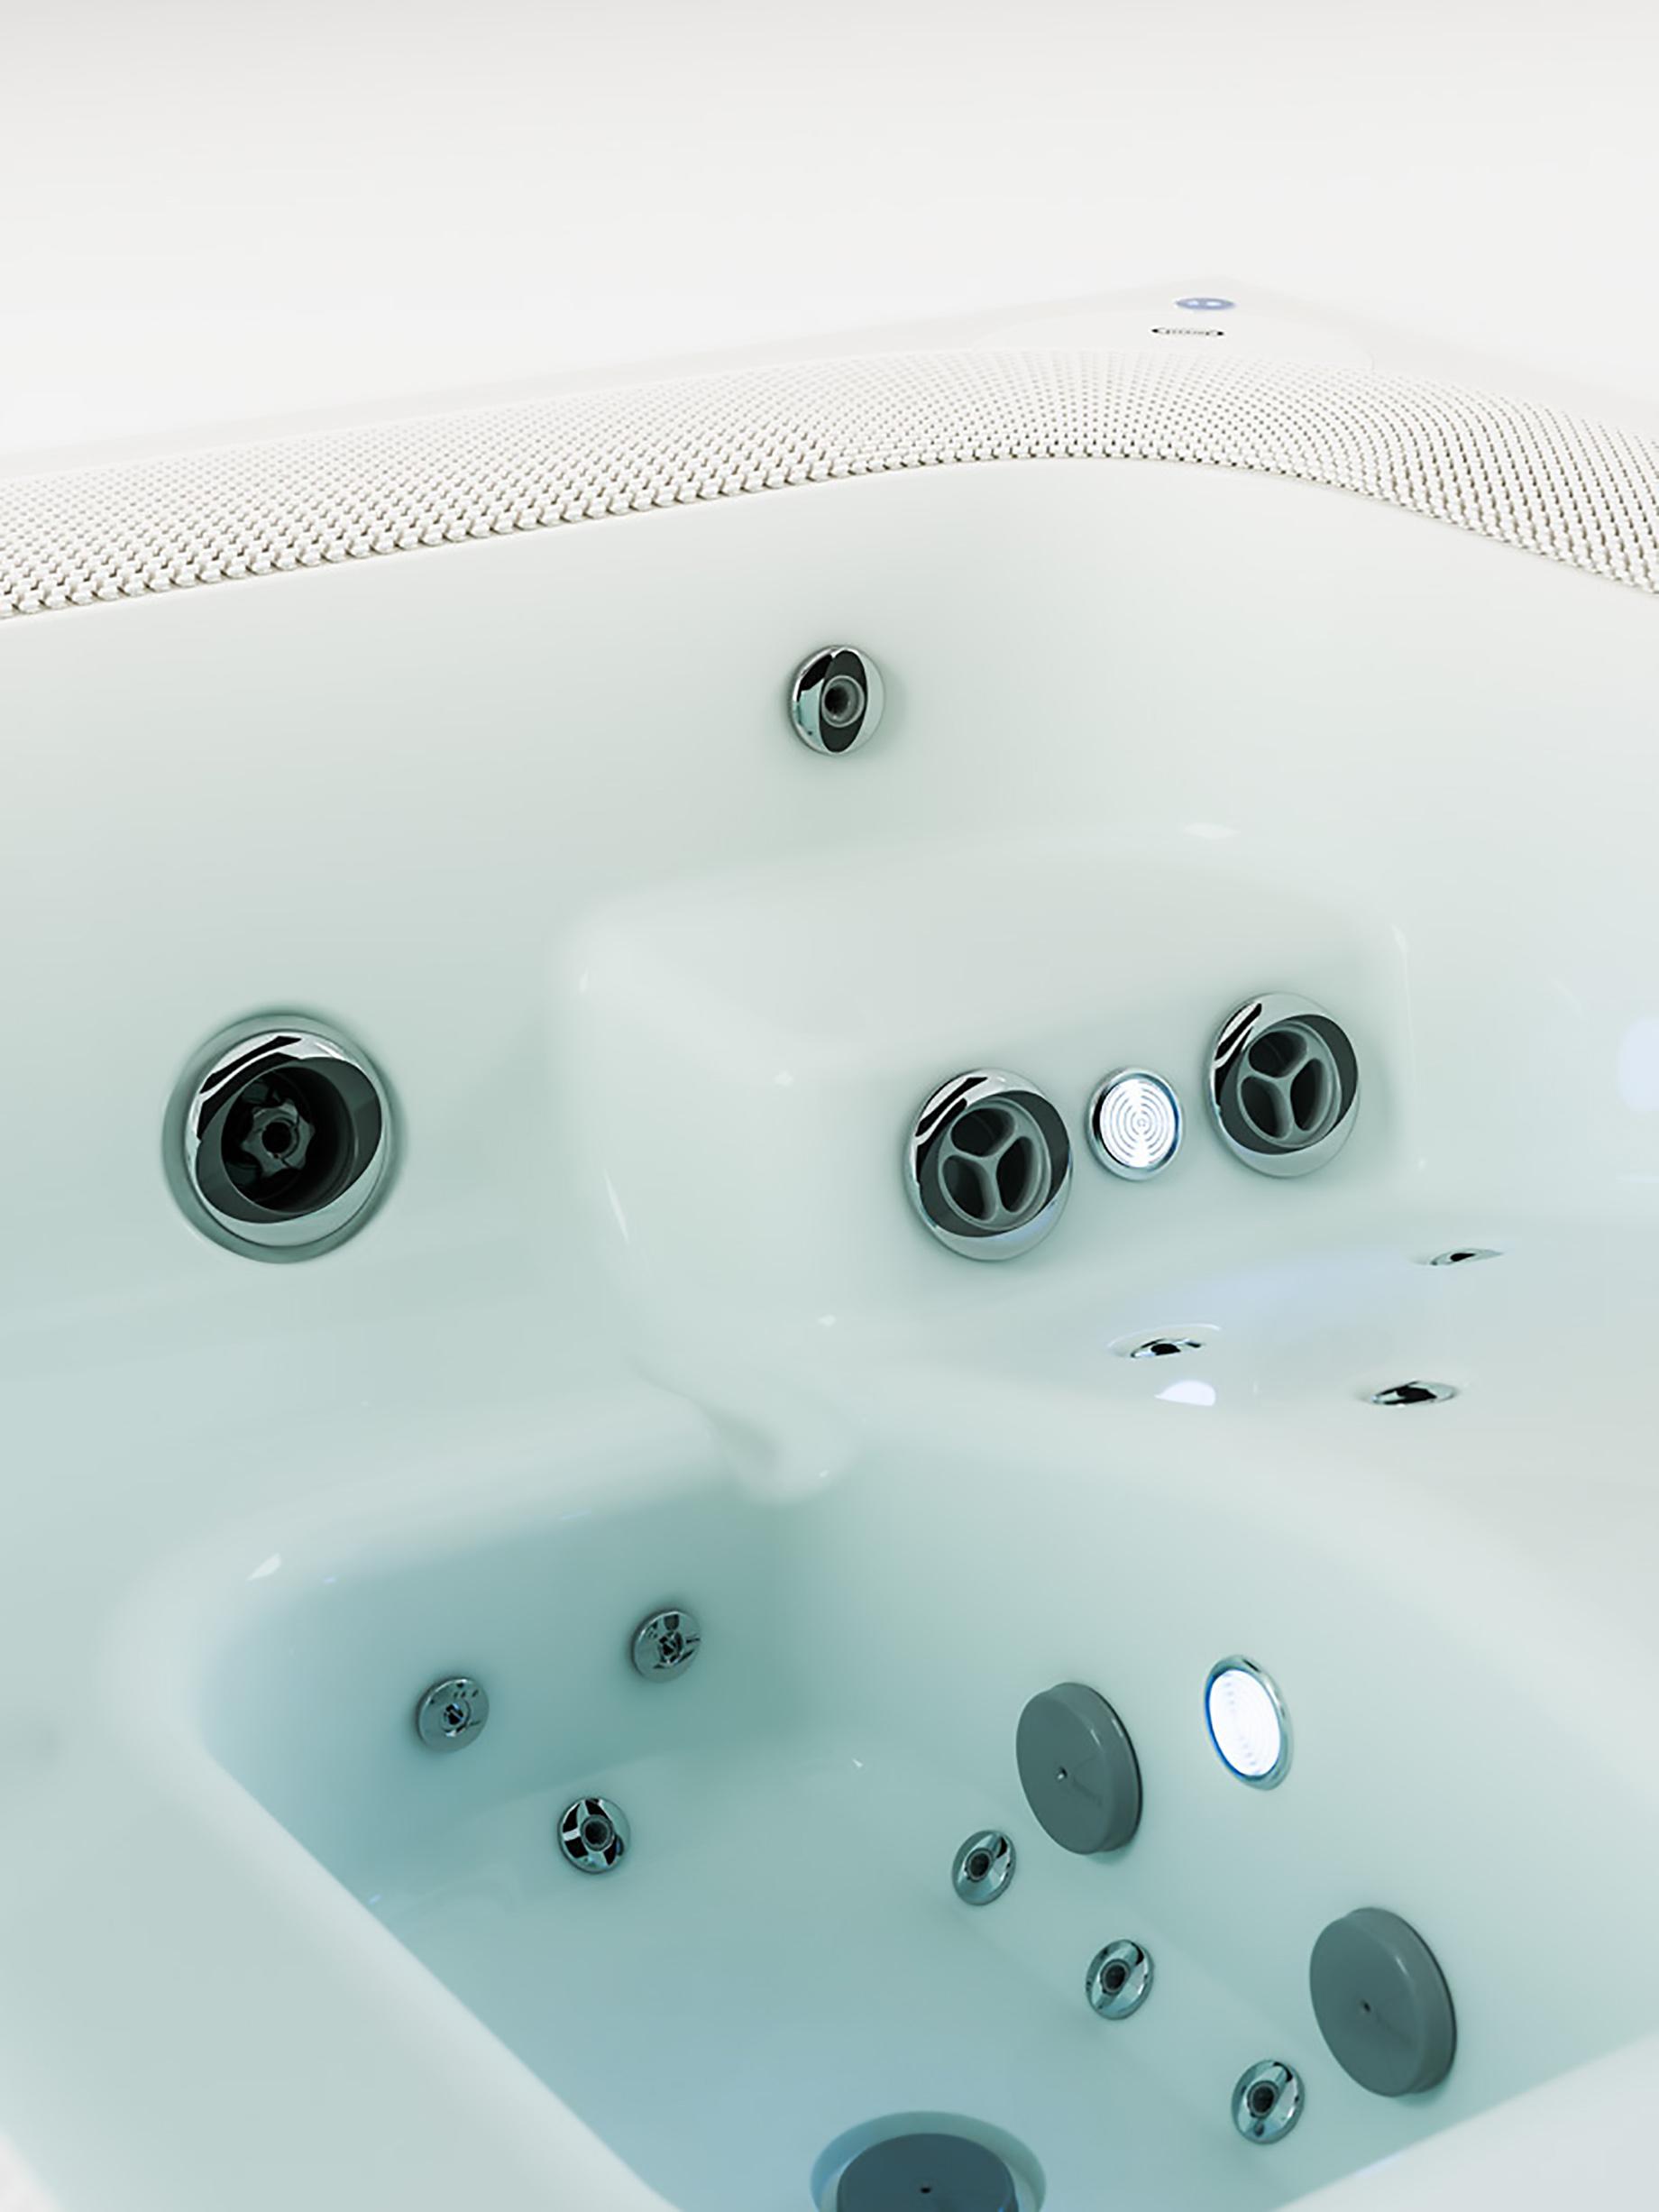 VIRTUS the Ultimate Luxury Hot Tub Hydromassage Spa by Jacuzzi